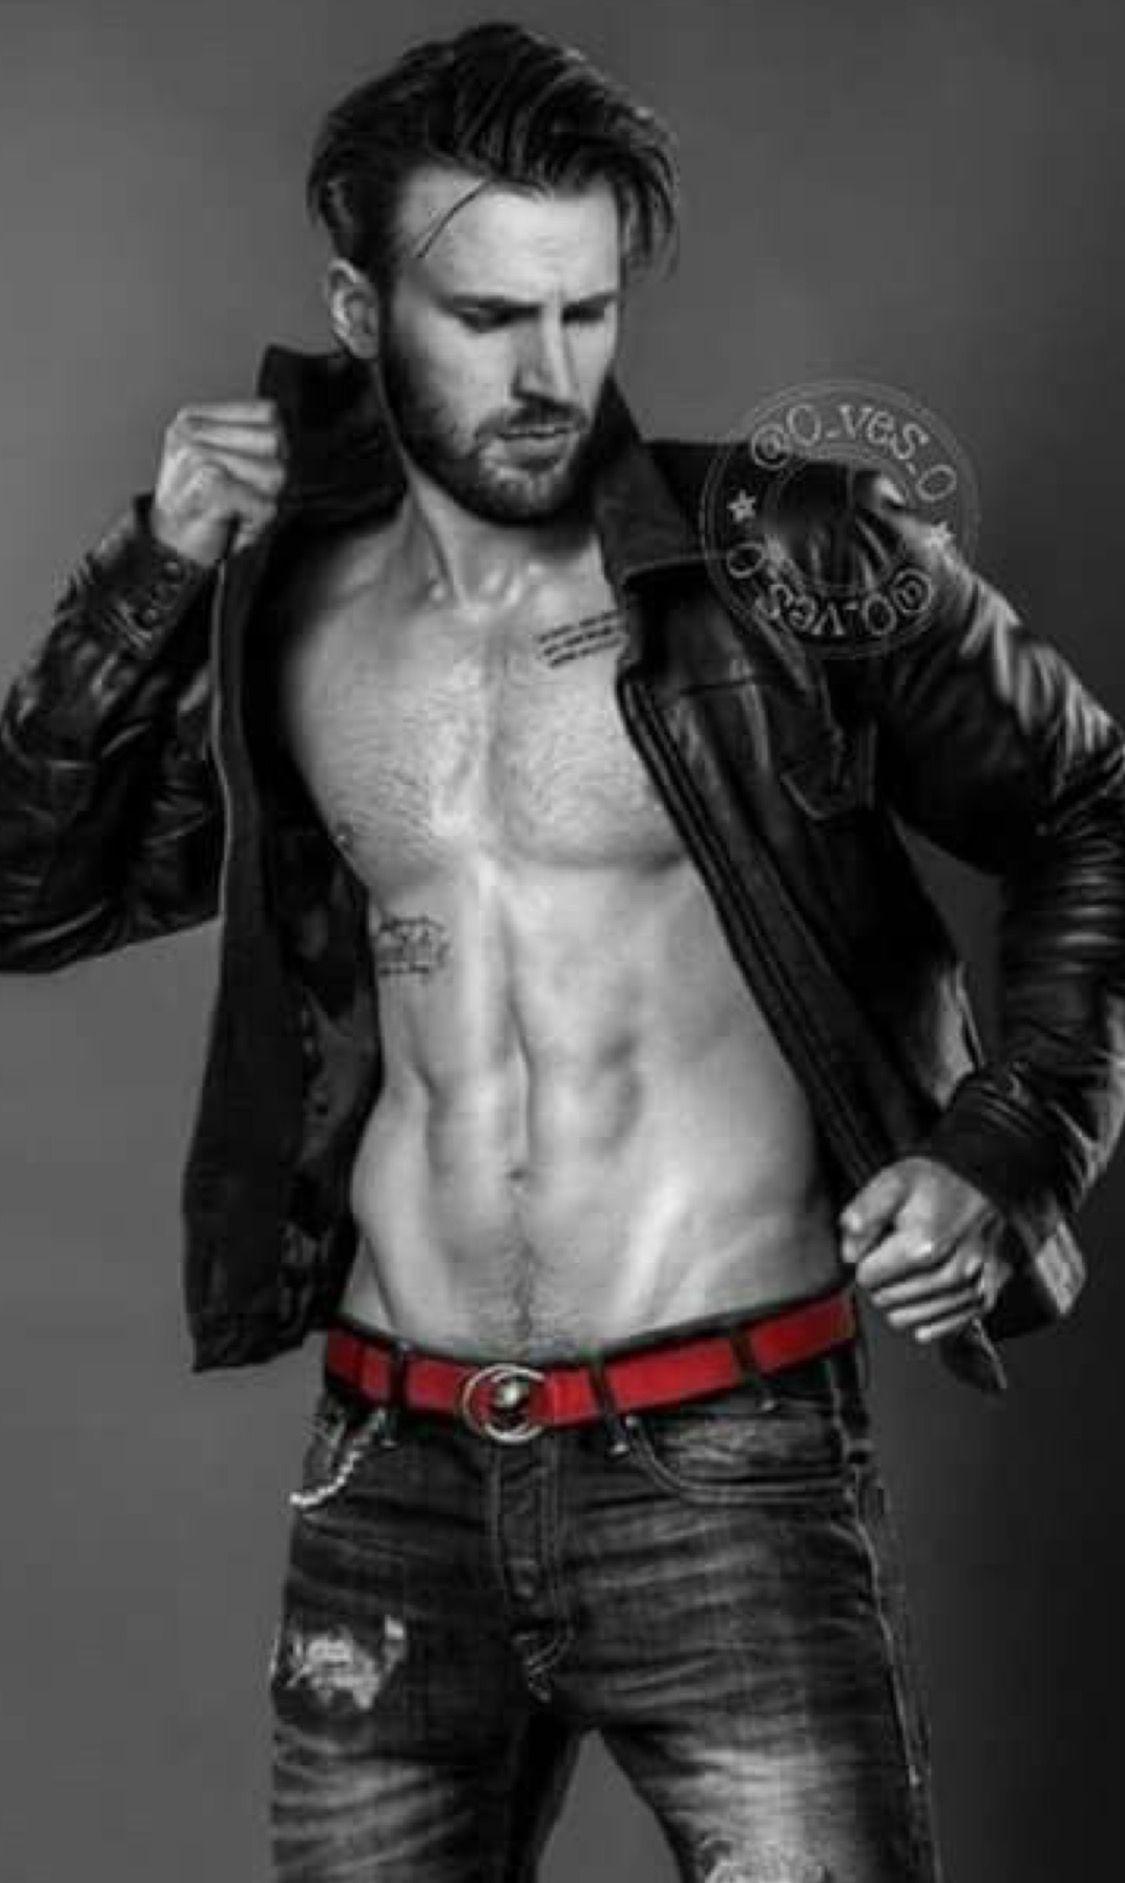 Brickhouse on Twitter | Chris evans shirtless, Chris evans